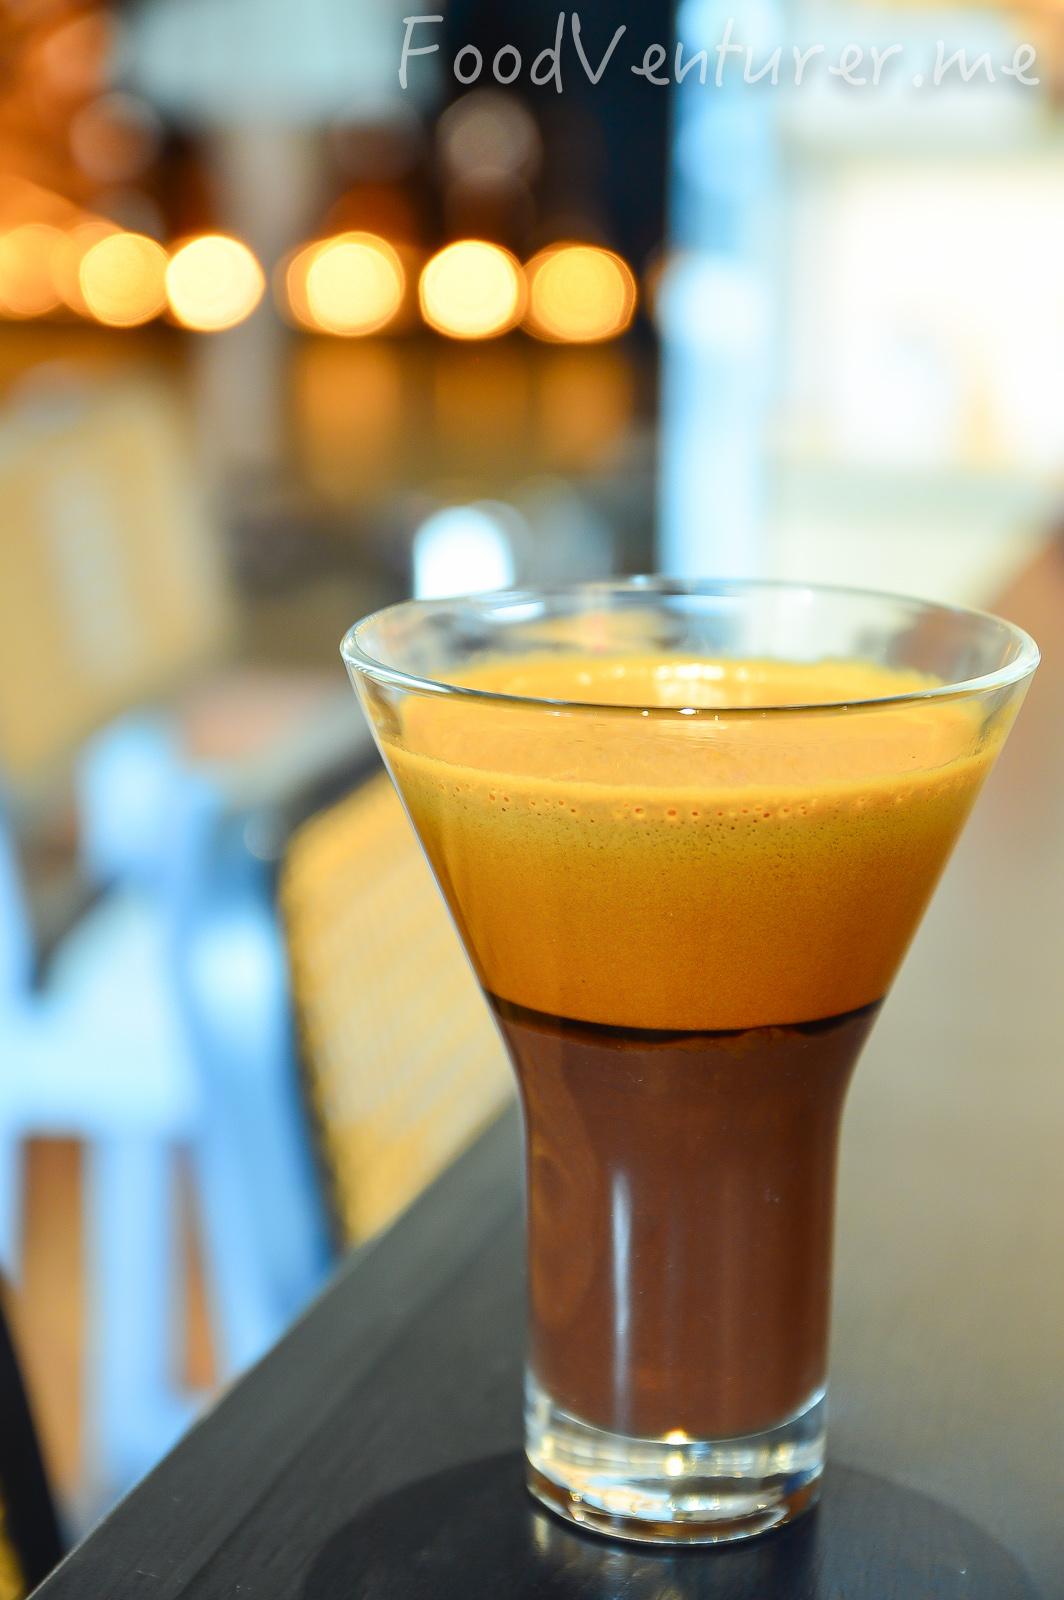 Half & Half - Le Cafe Gourmand, Gunawarman